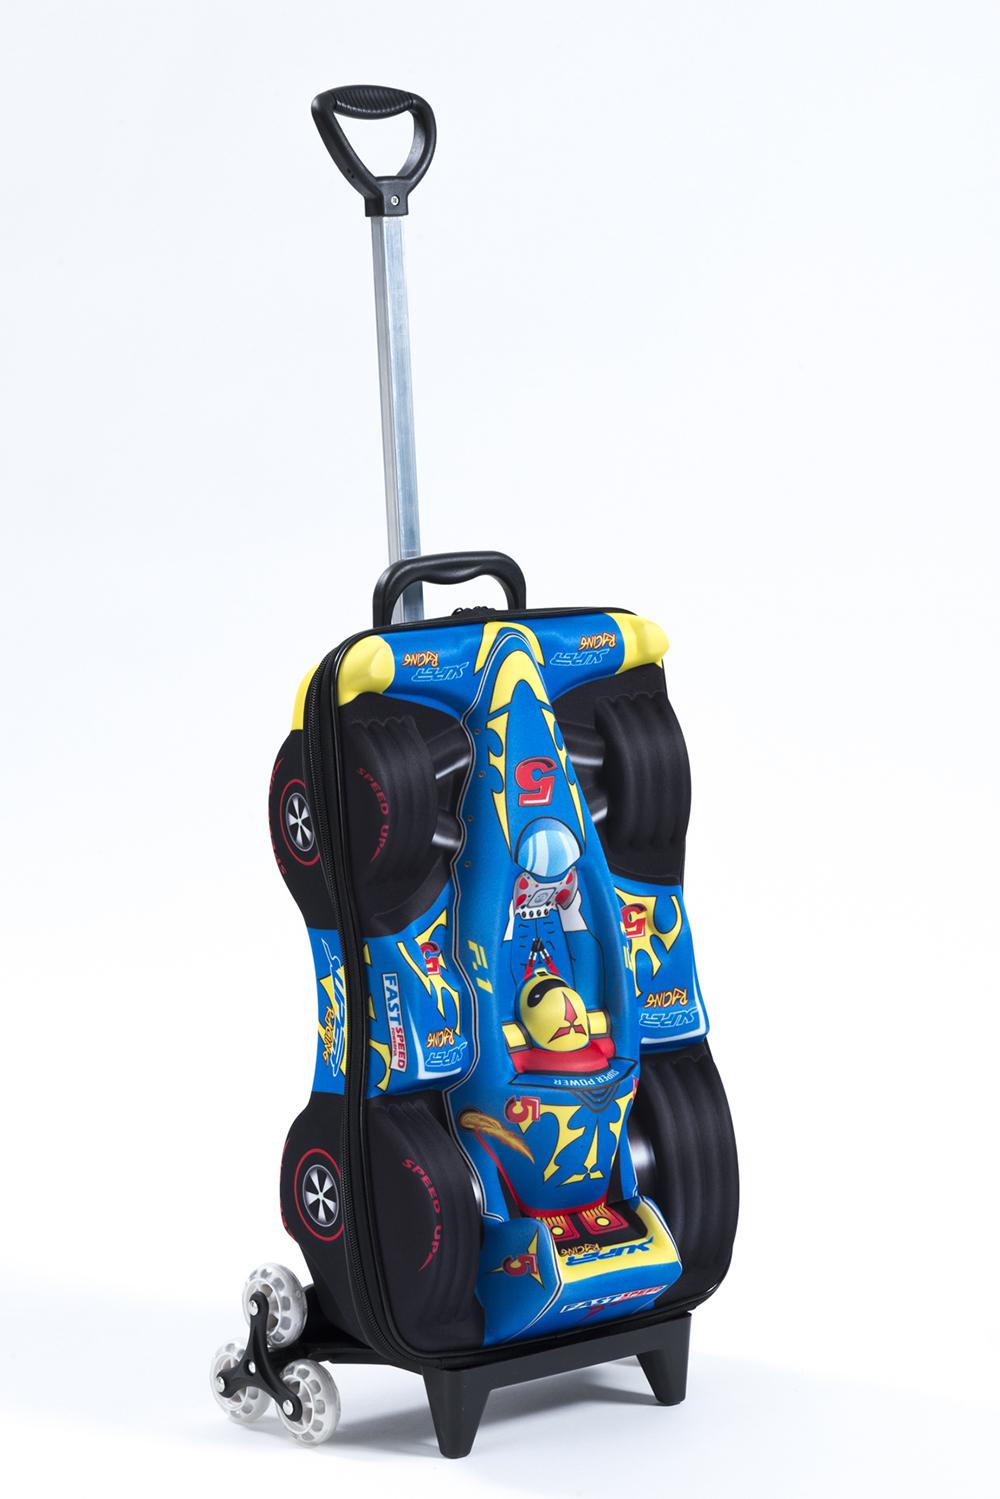 3 Wheel Rolling Bag - Blue Super Power Racecar